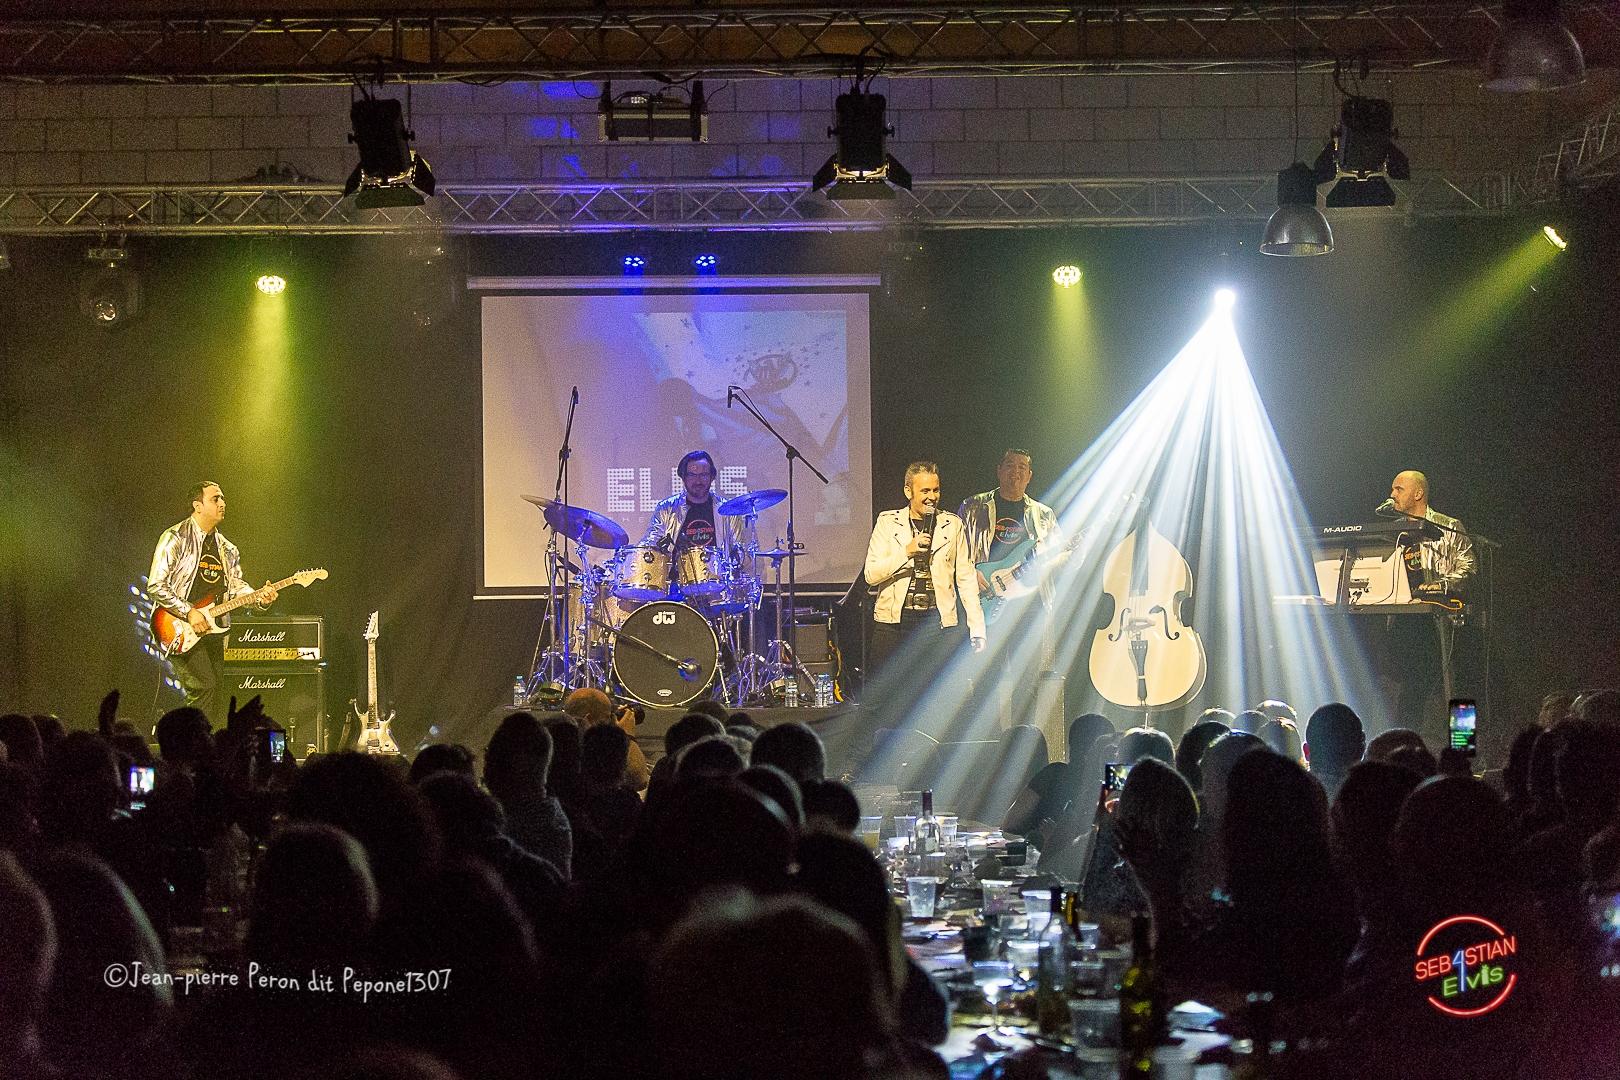 sebastian-for-elvis-pepone1307-centre-culturel-rocourt-facebook-06